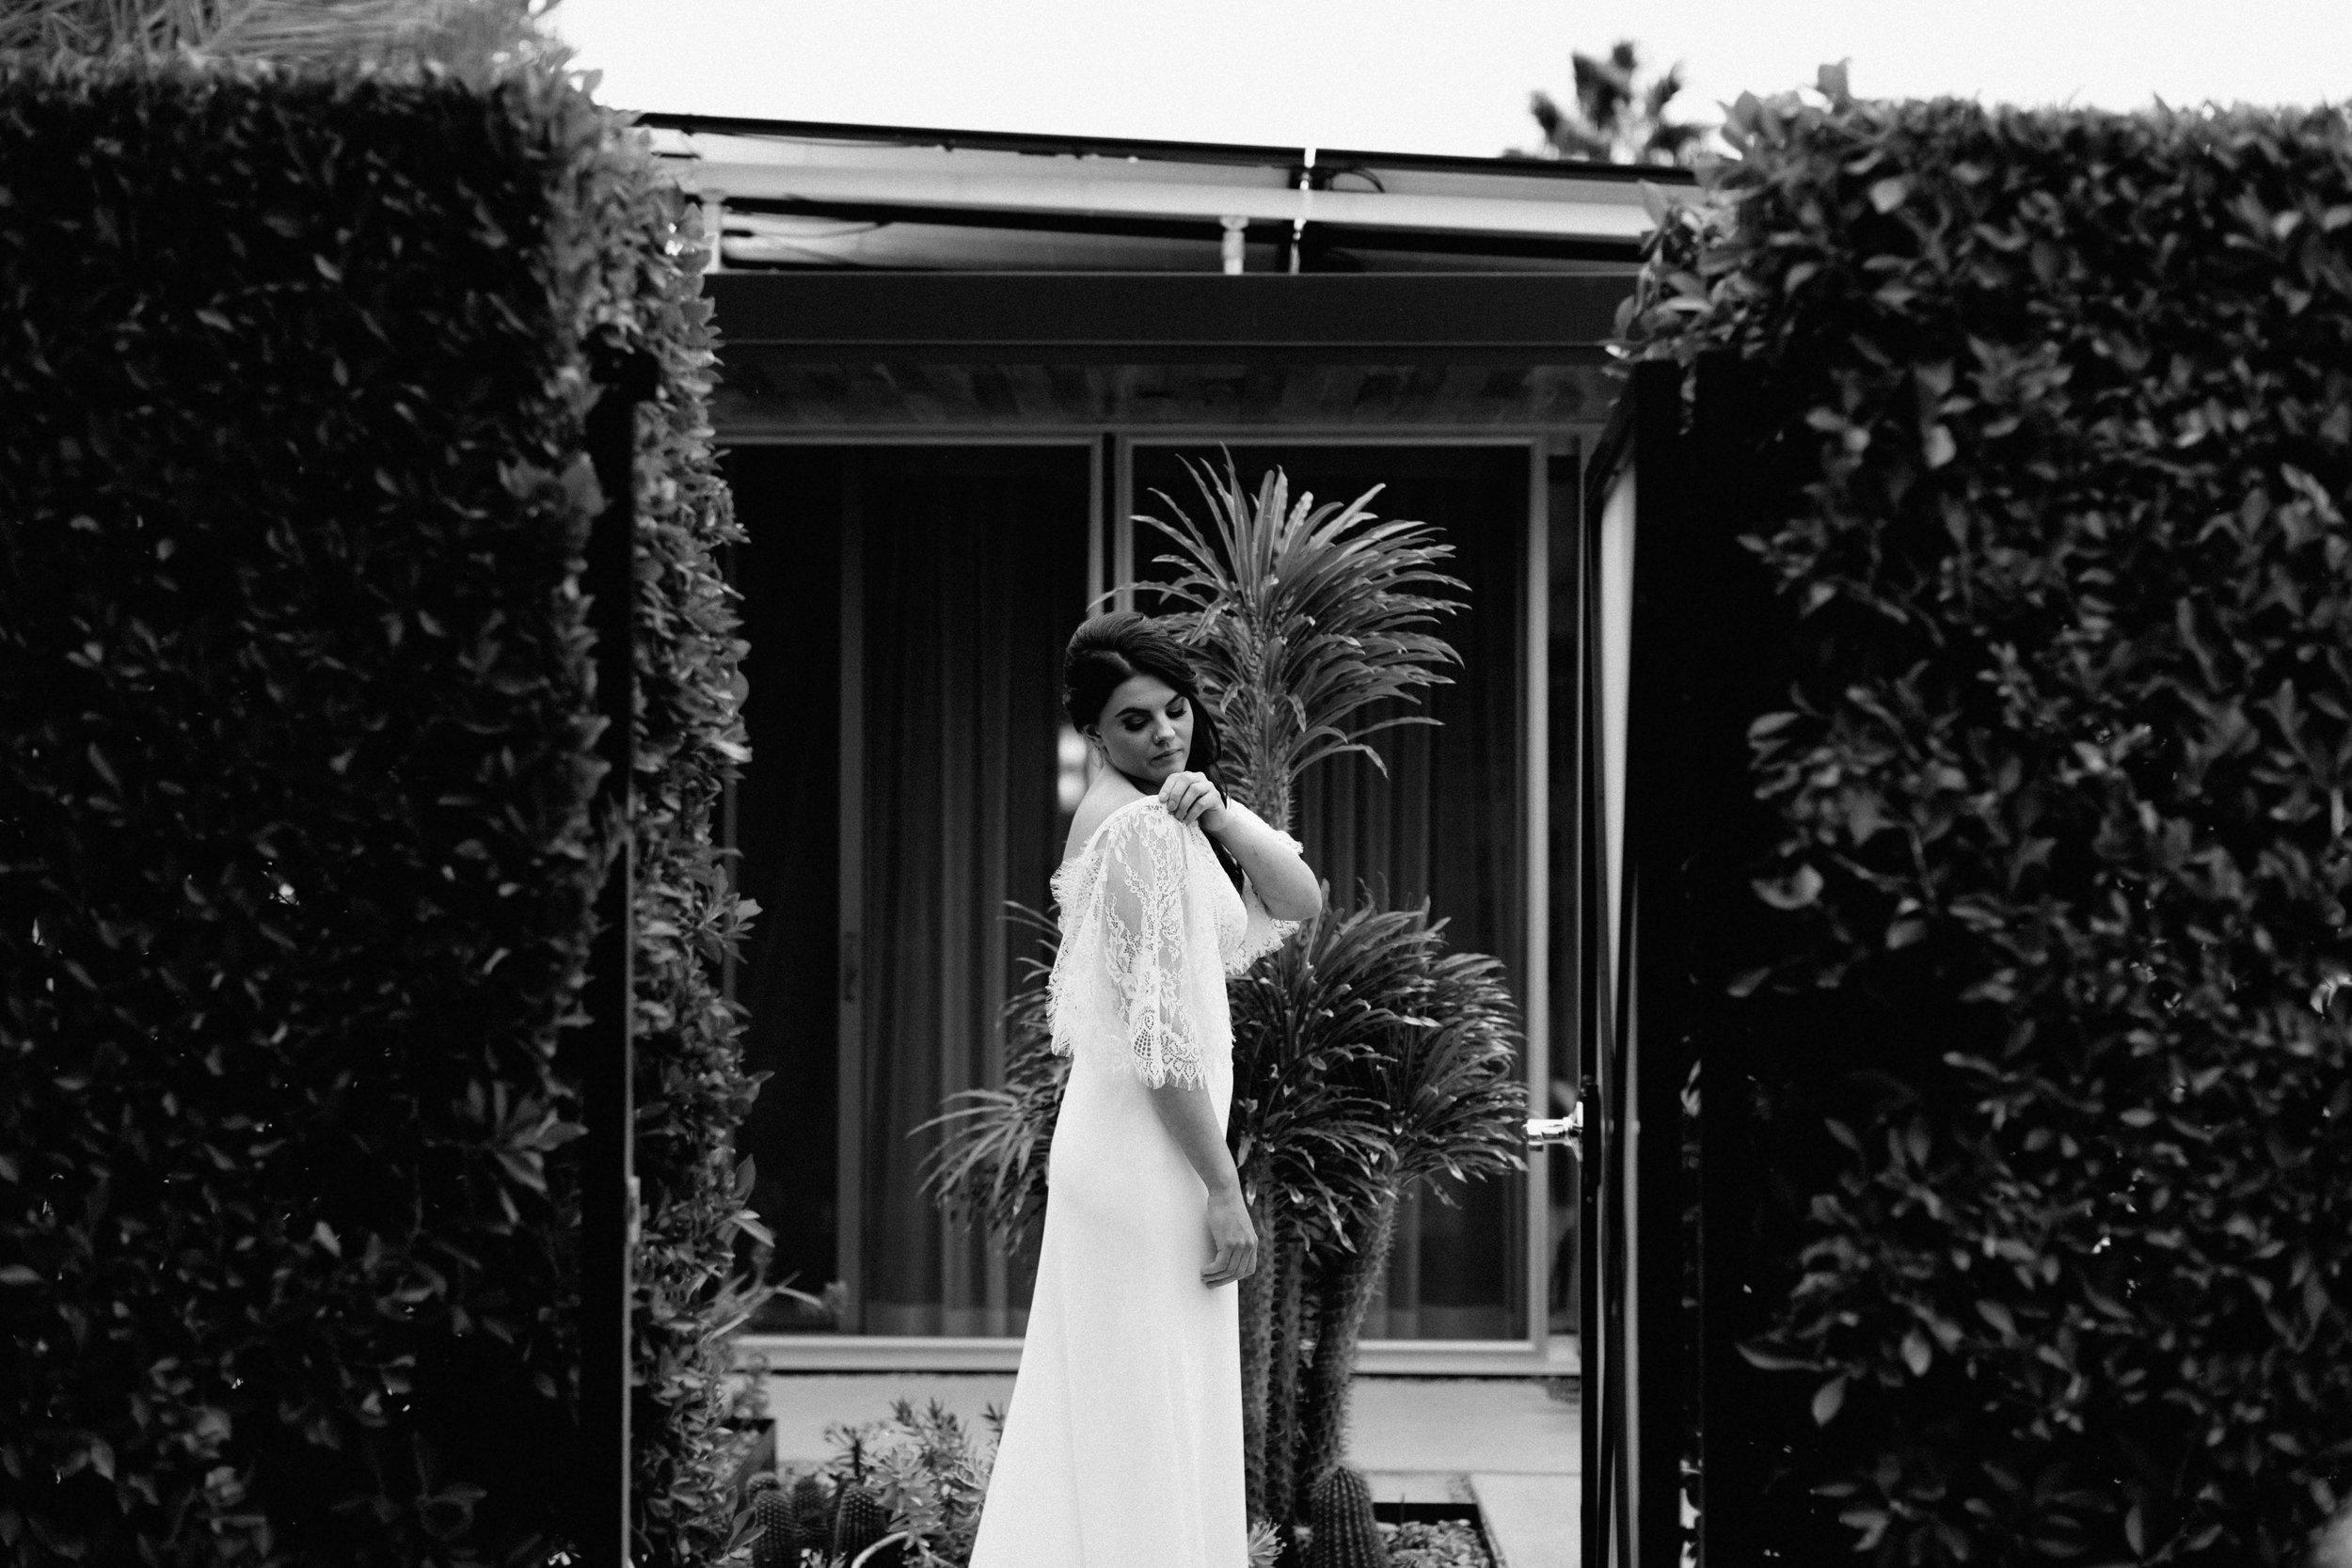 America Joshua Tree Palm Springs Elopement wedding-11.jpg